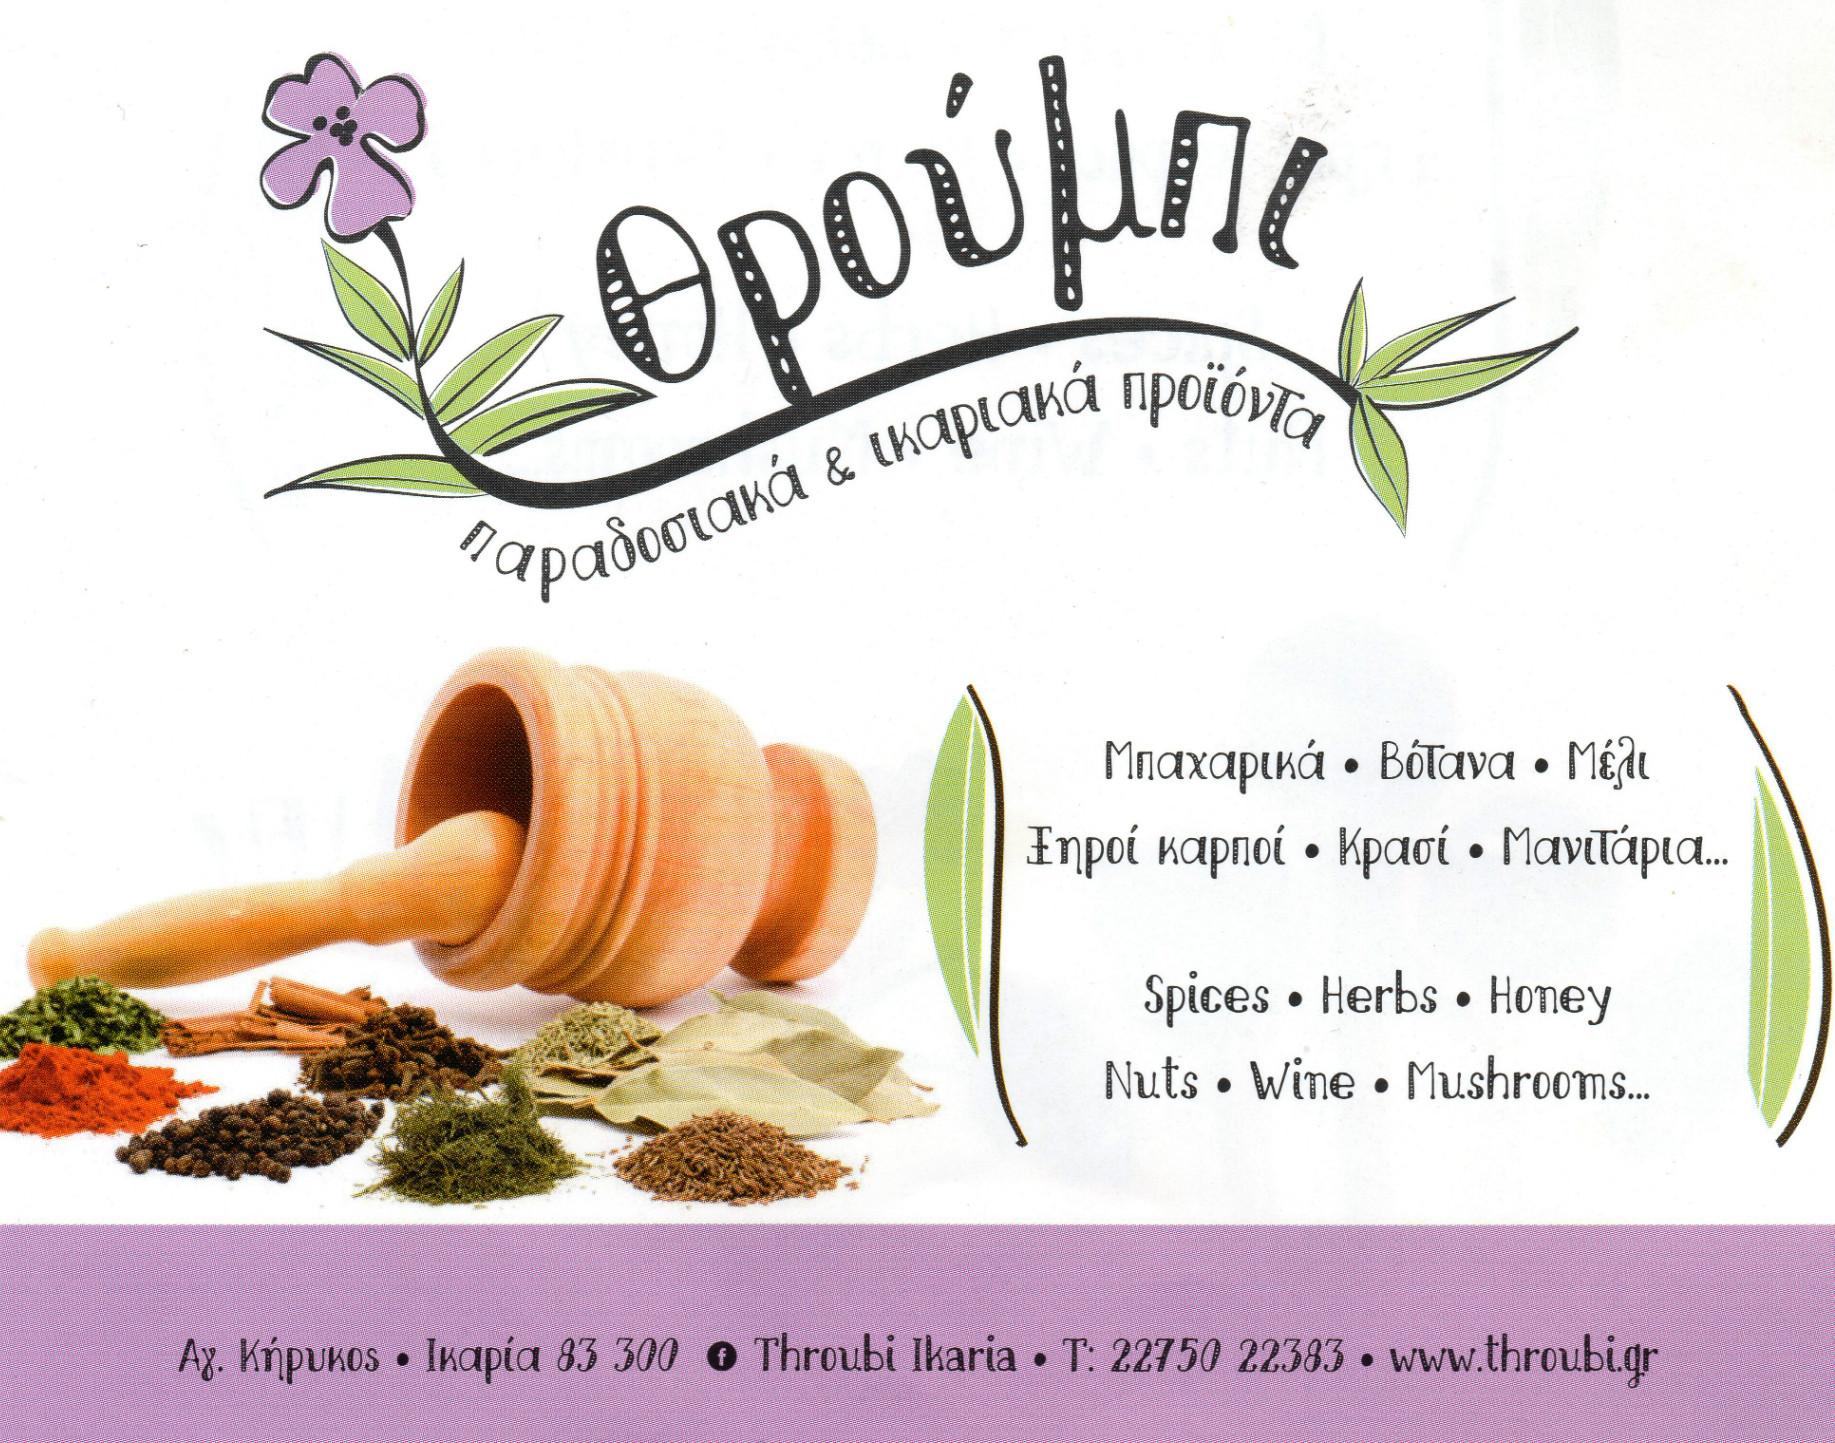 Throubi - Traditional & Ikarian Products  Ikaria Island